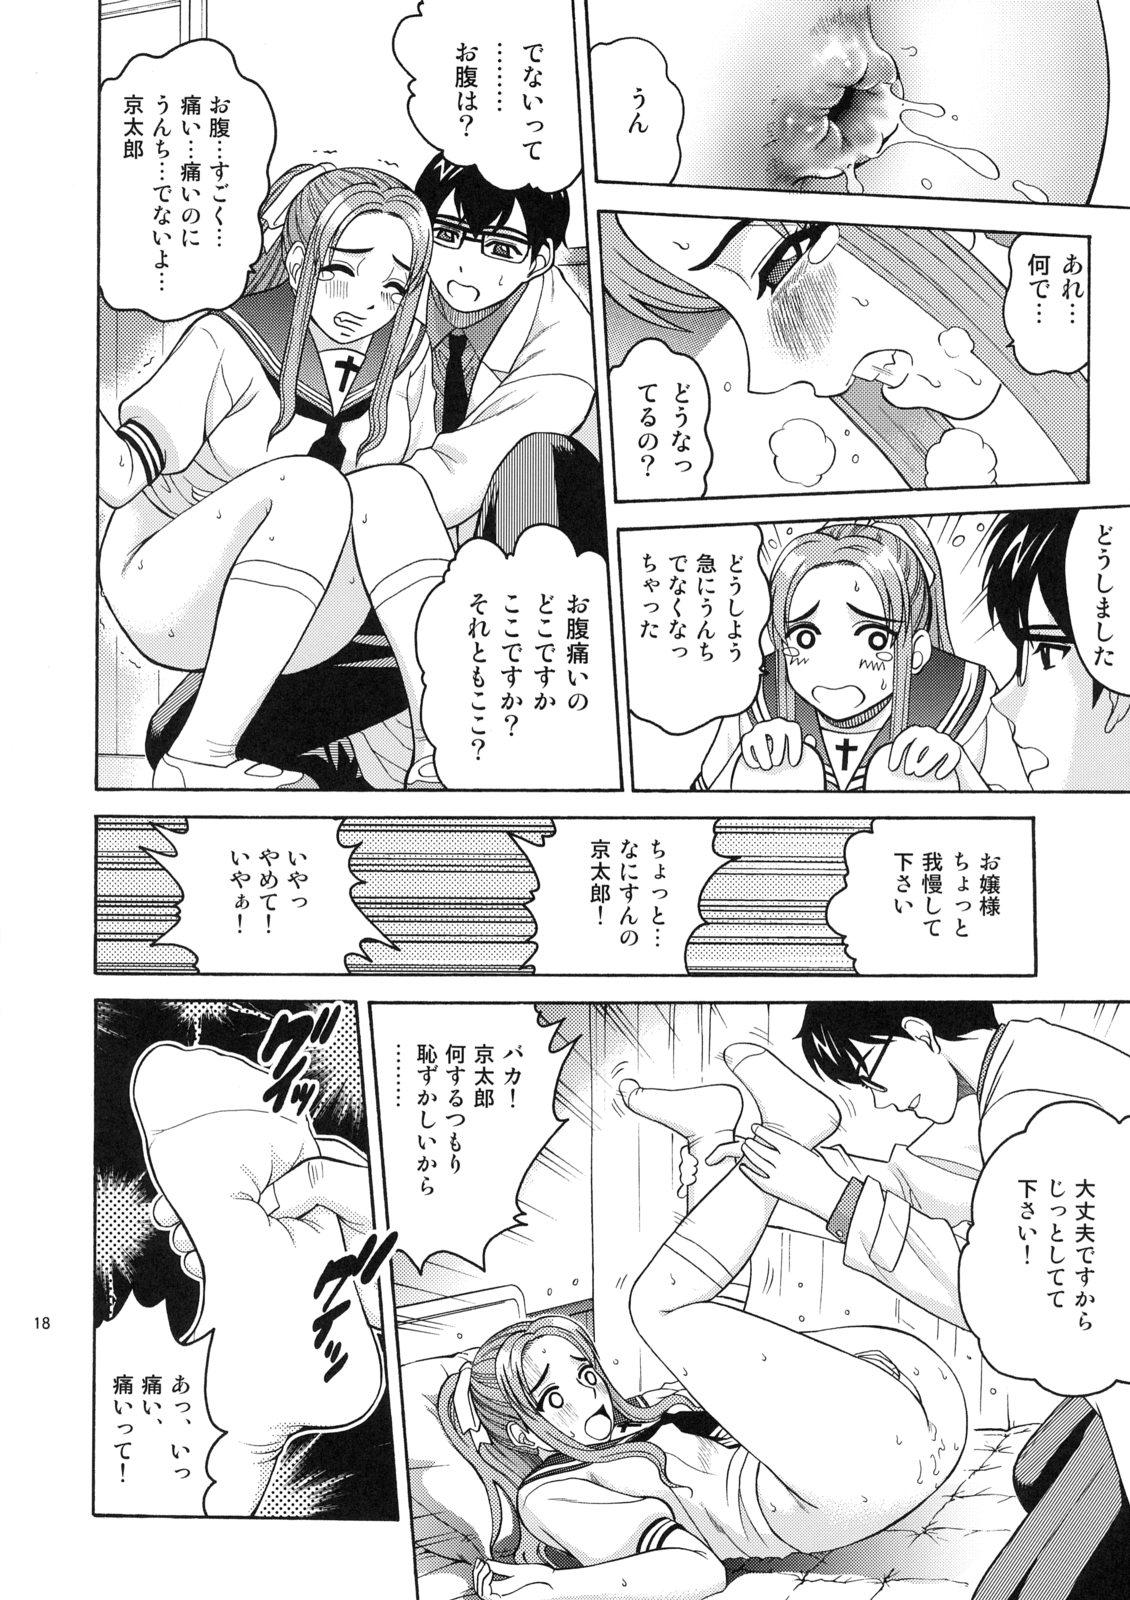 (C72) [Cool Brain (Kitani Sai)] ANGEL PAIN Extra 4 -Ojou-sama Scatology- 16